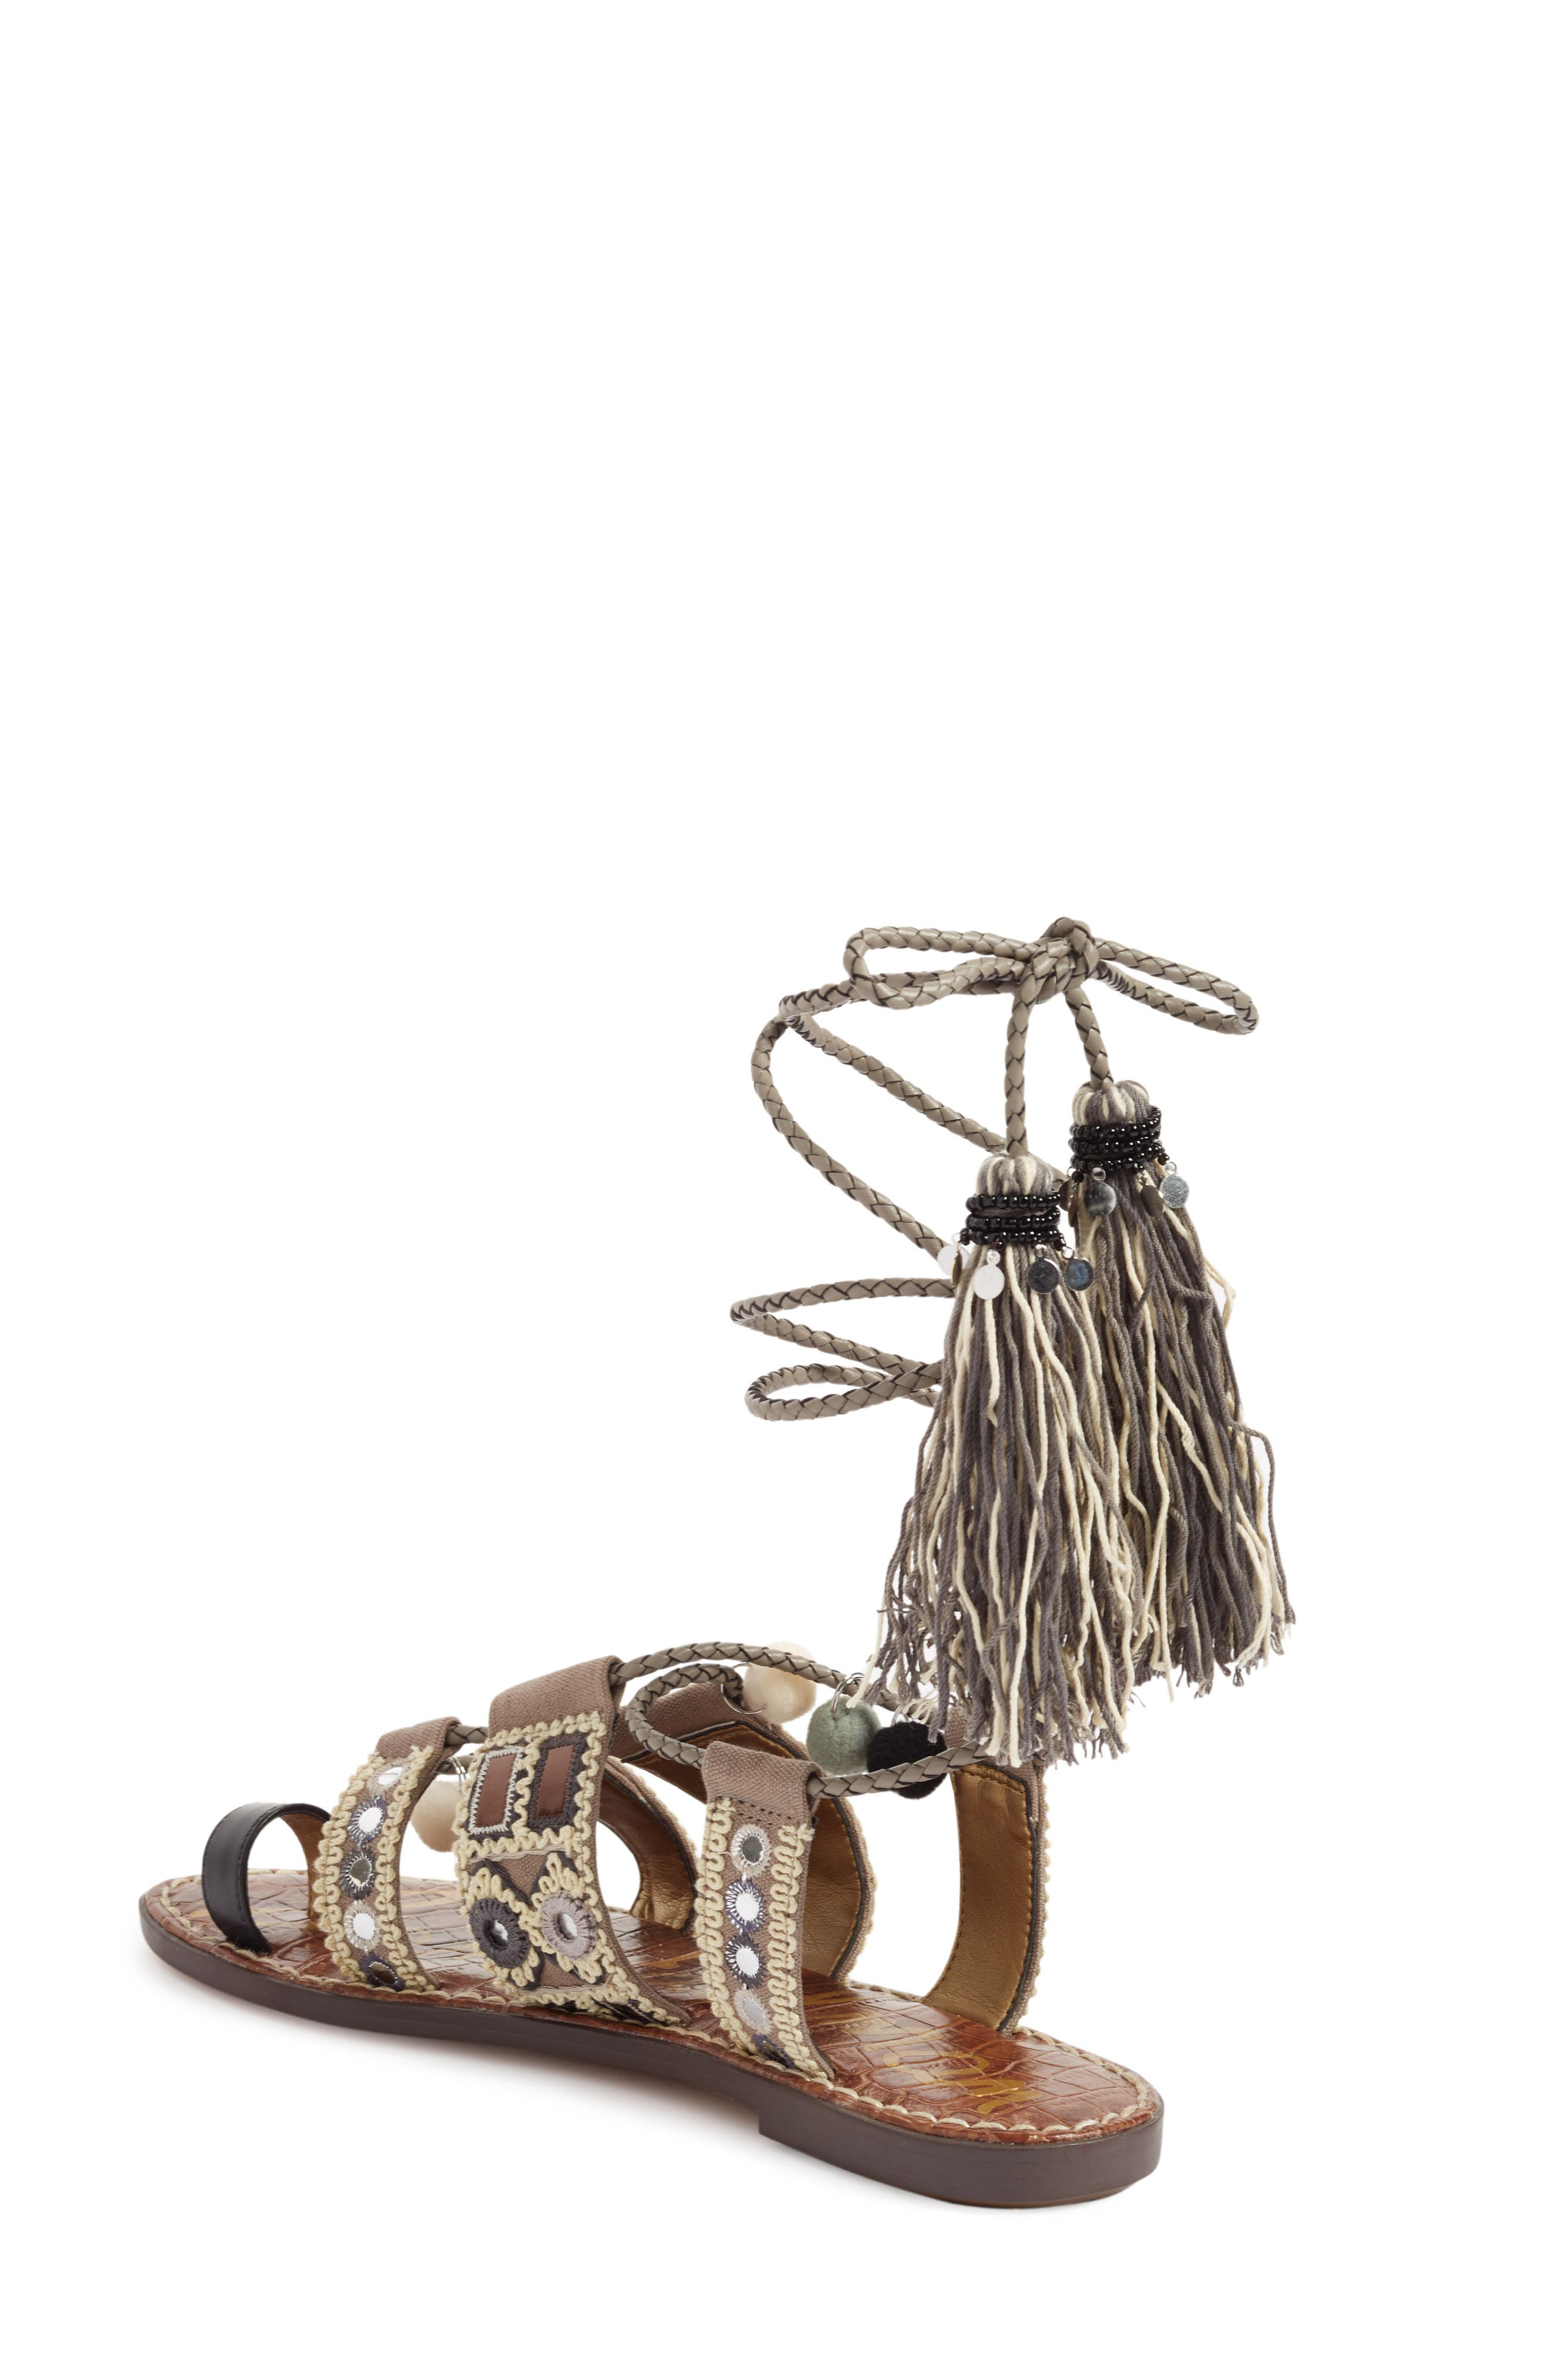 Gretchen Gladiator Sandal,                             Alternate thumbnail 2, color,                             020